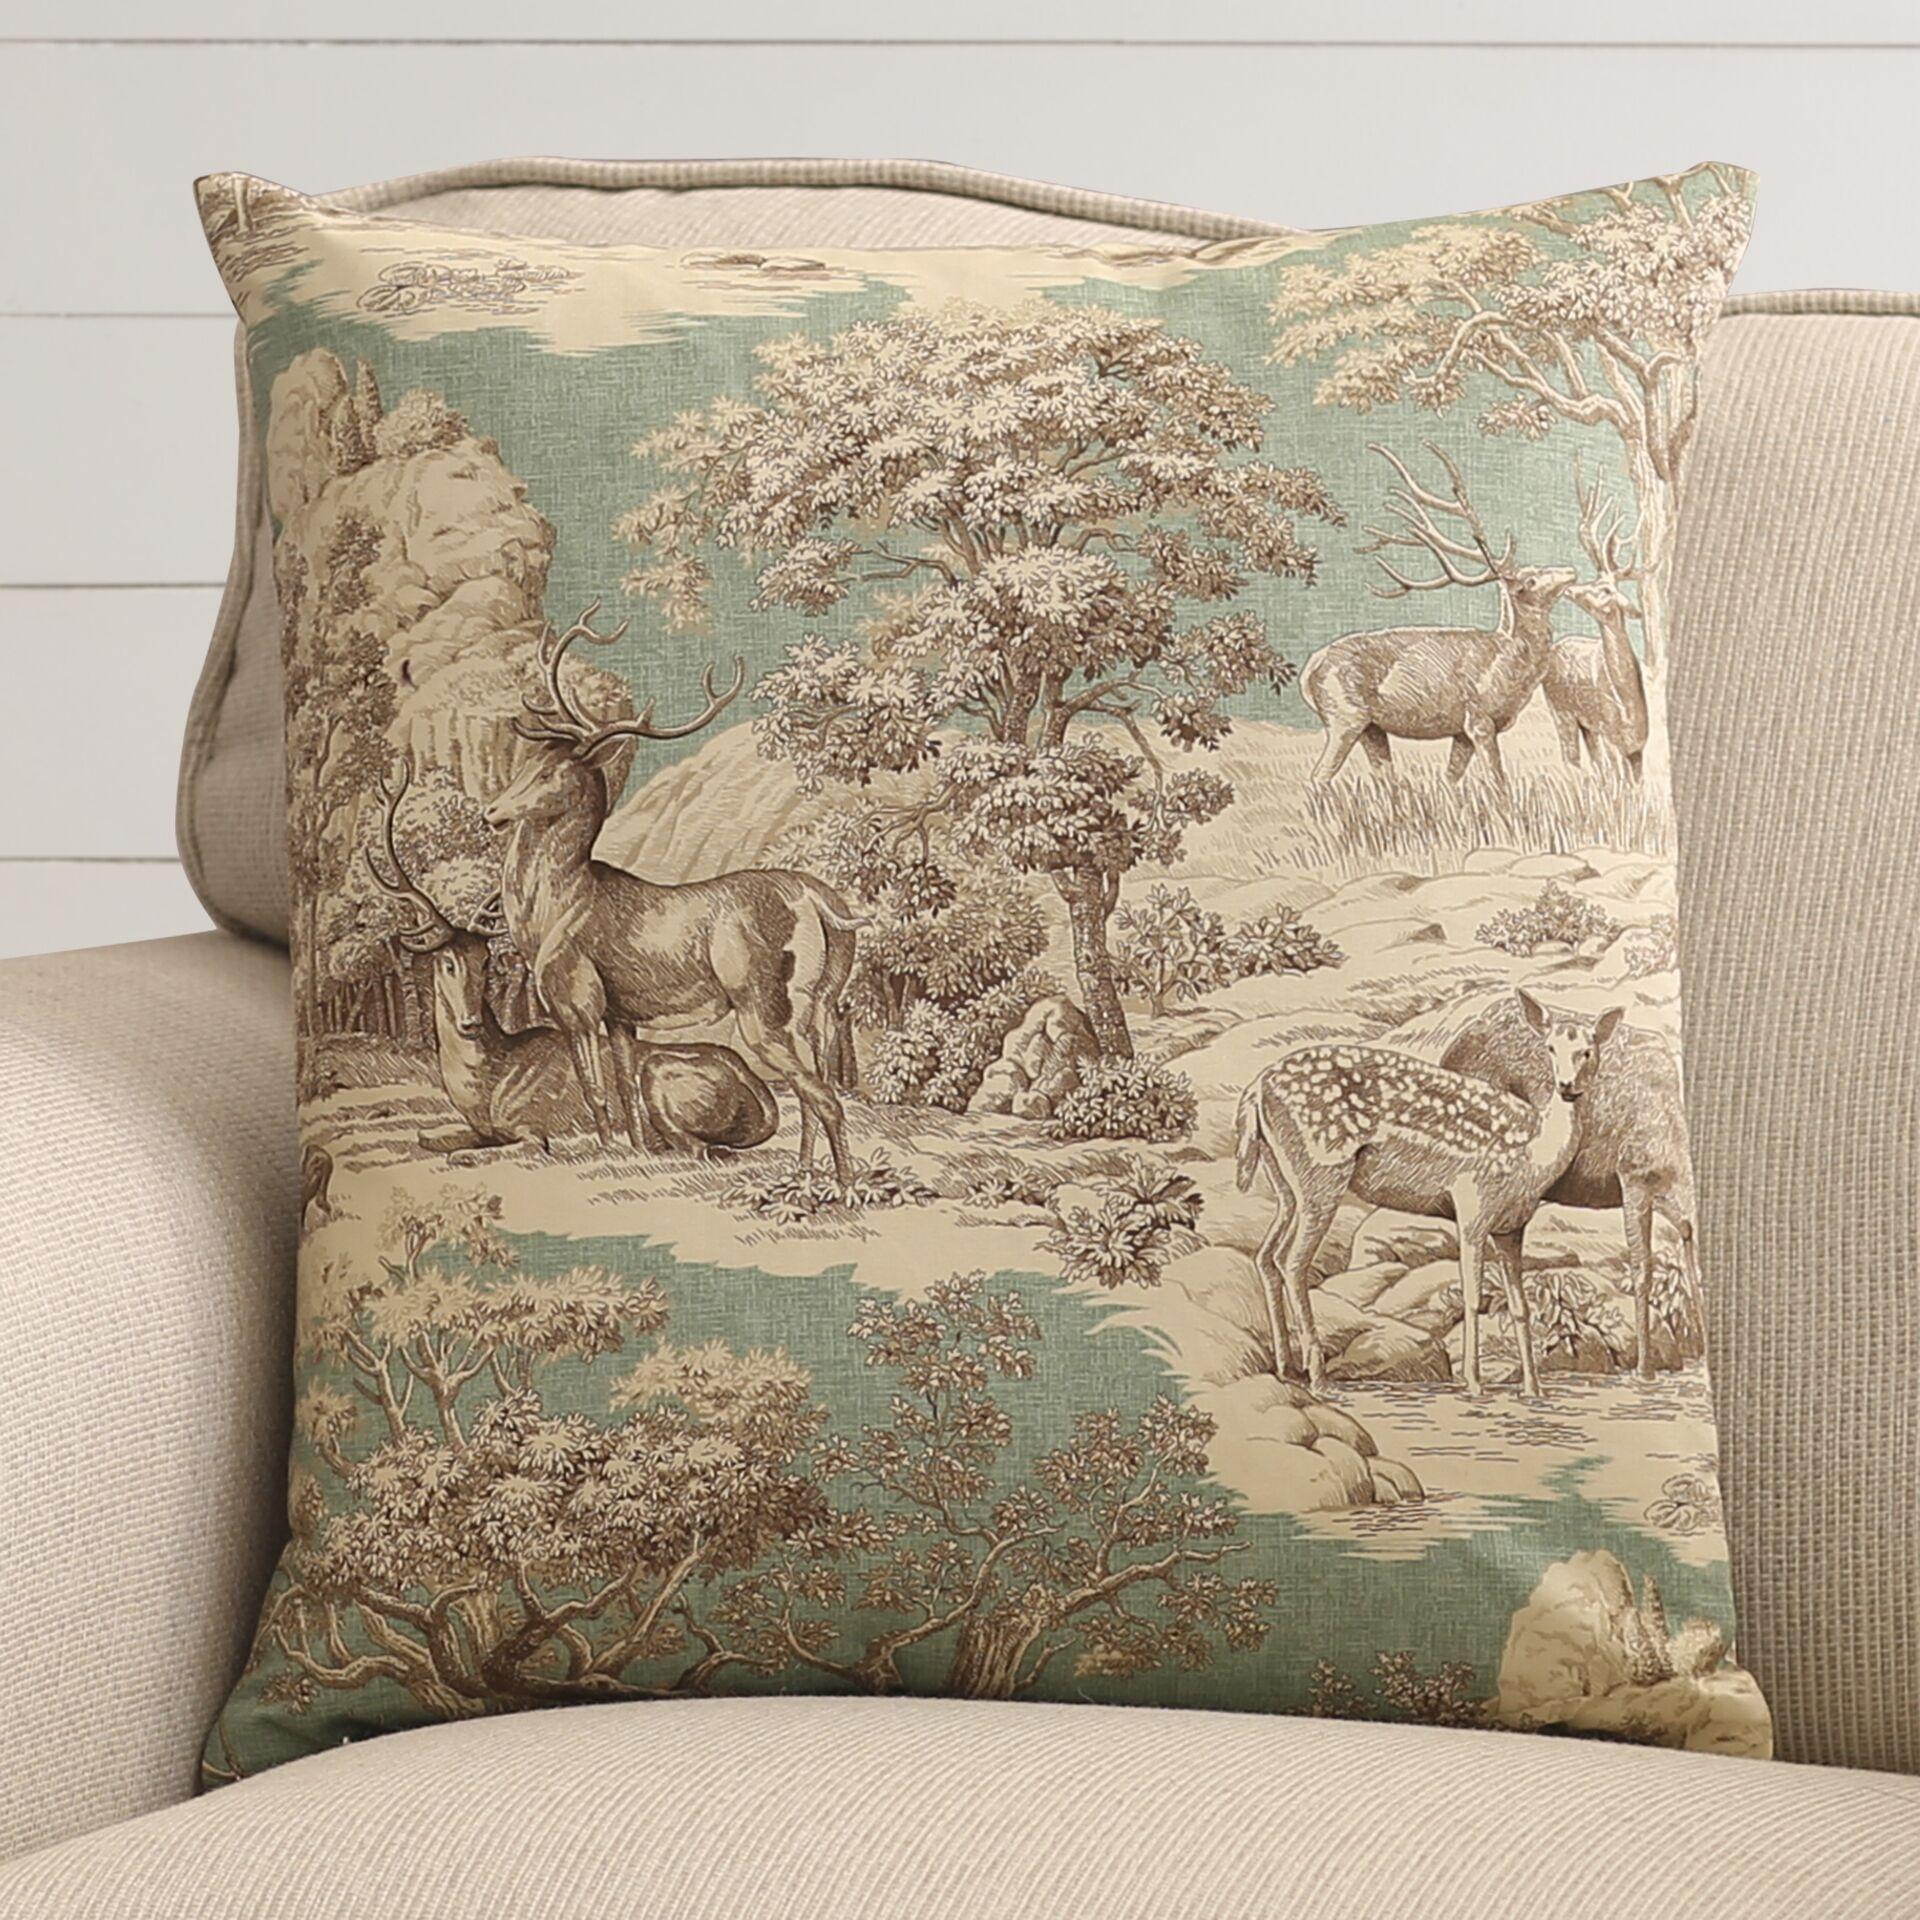 Leora 100% Cotton Throw Pillow Color: Aqua Back, Size: 20